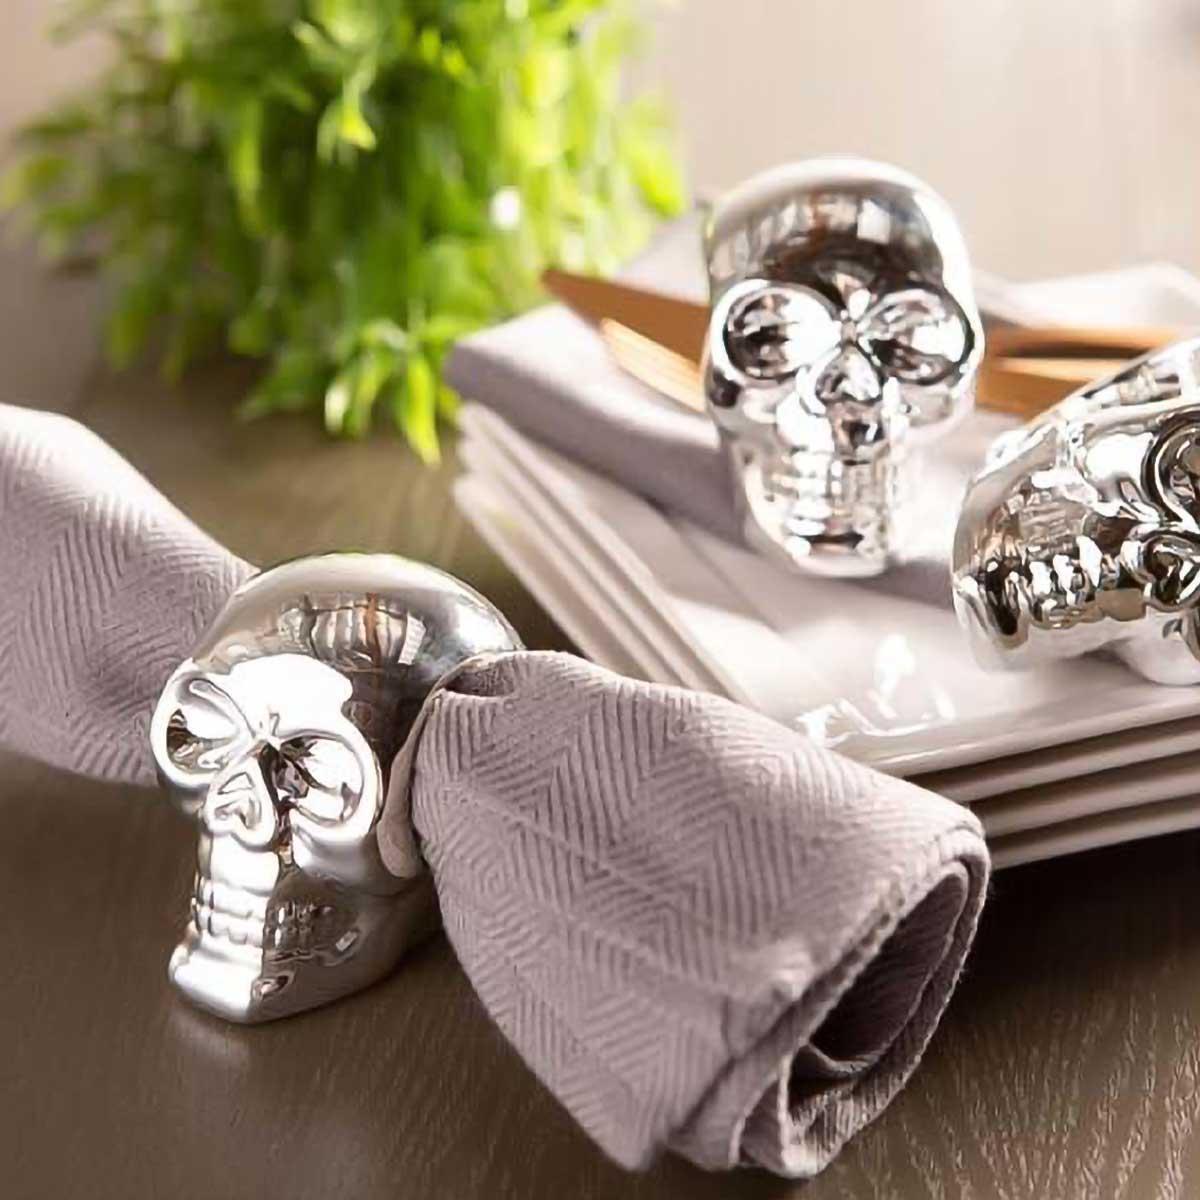 Skull Napkin and Napkin RIng Set